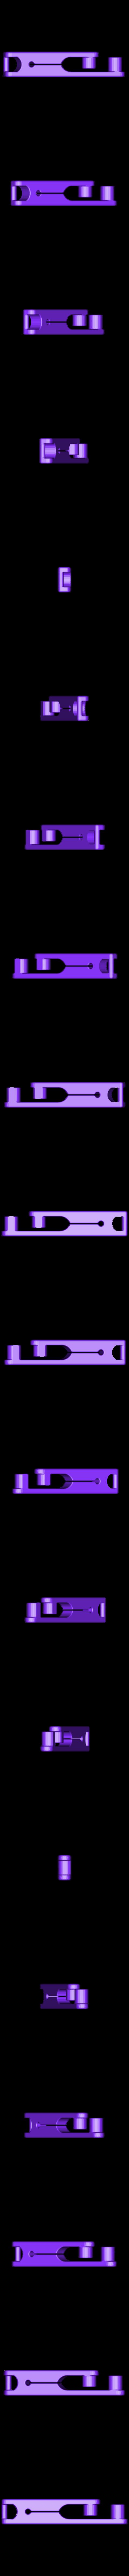 SpringClip-Rev1.stl Download free STL file Carabiner with strong clip • 3D printer object, Raeunn3D